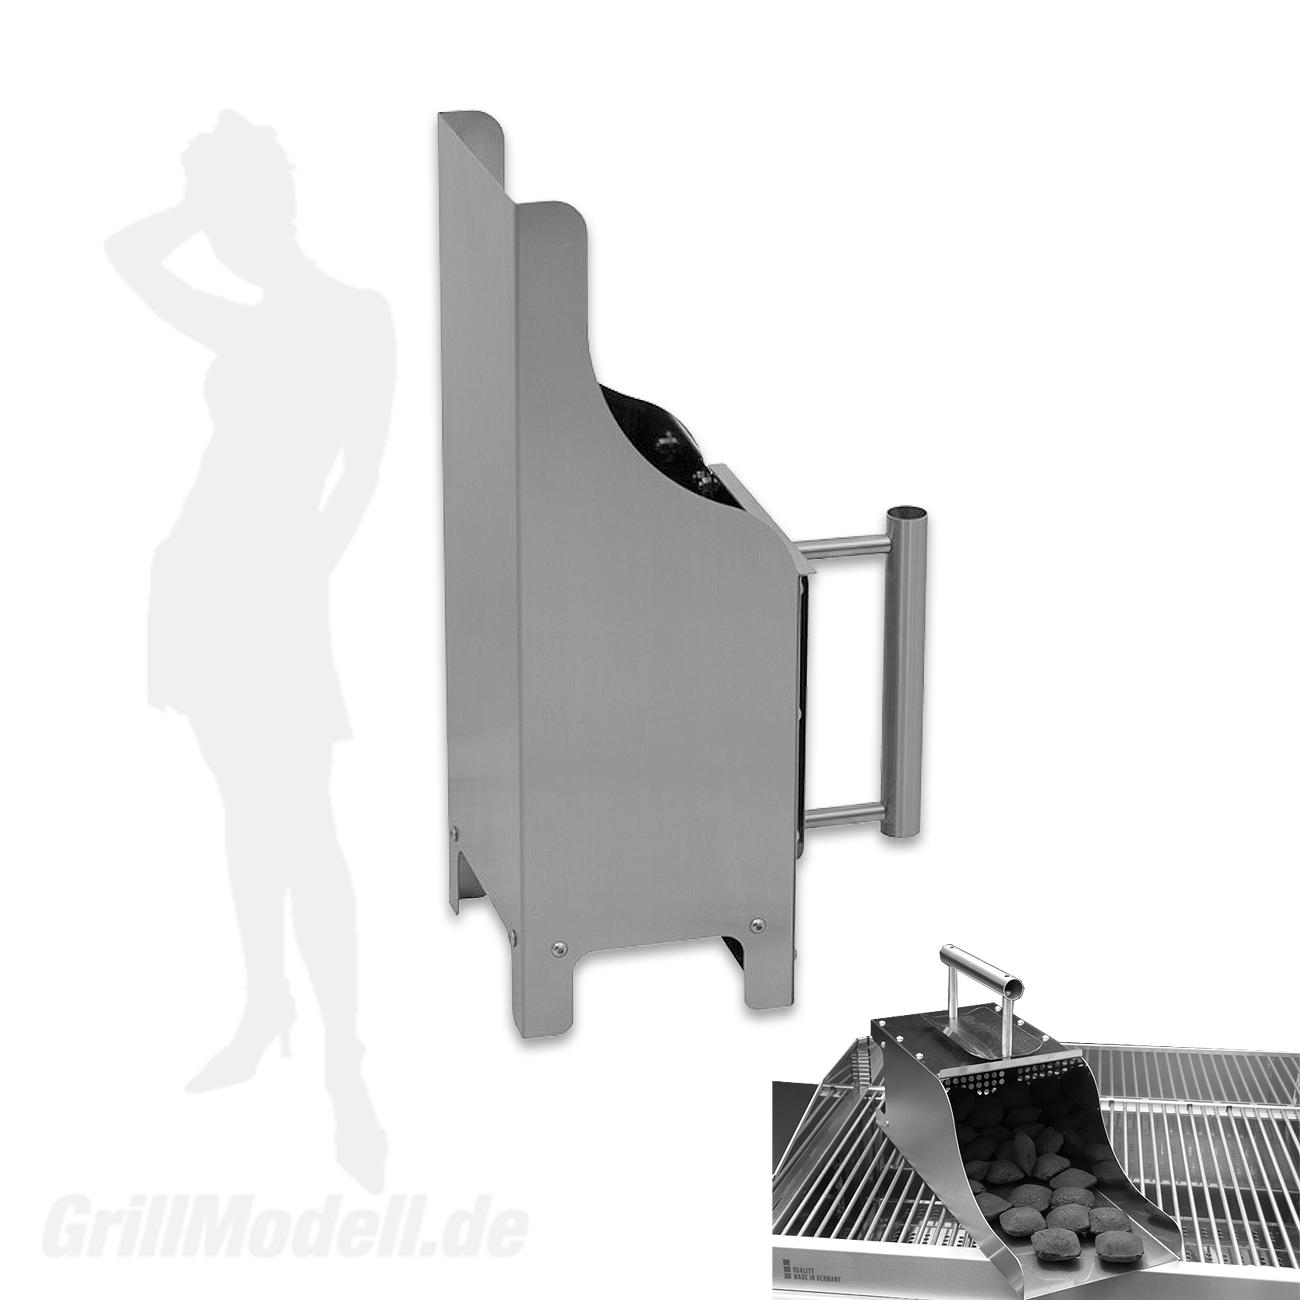 Grill Kohleanzünder für Edelstahlgrill Holzkohlegrill